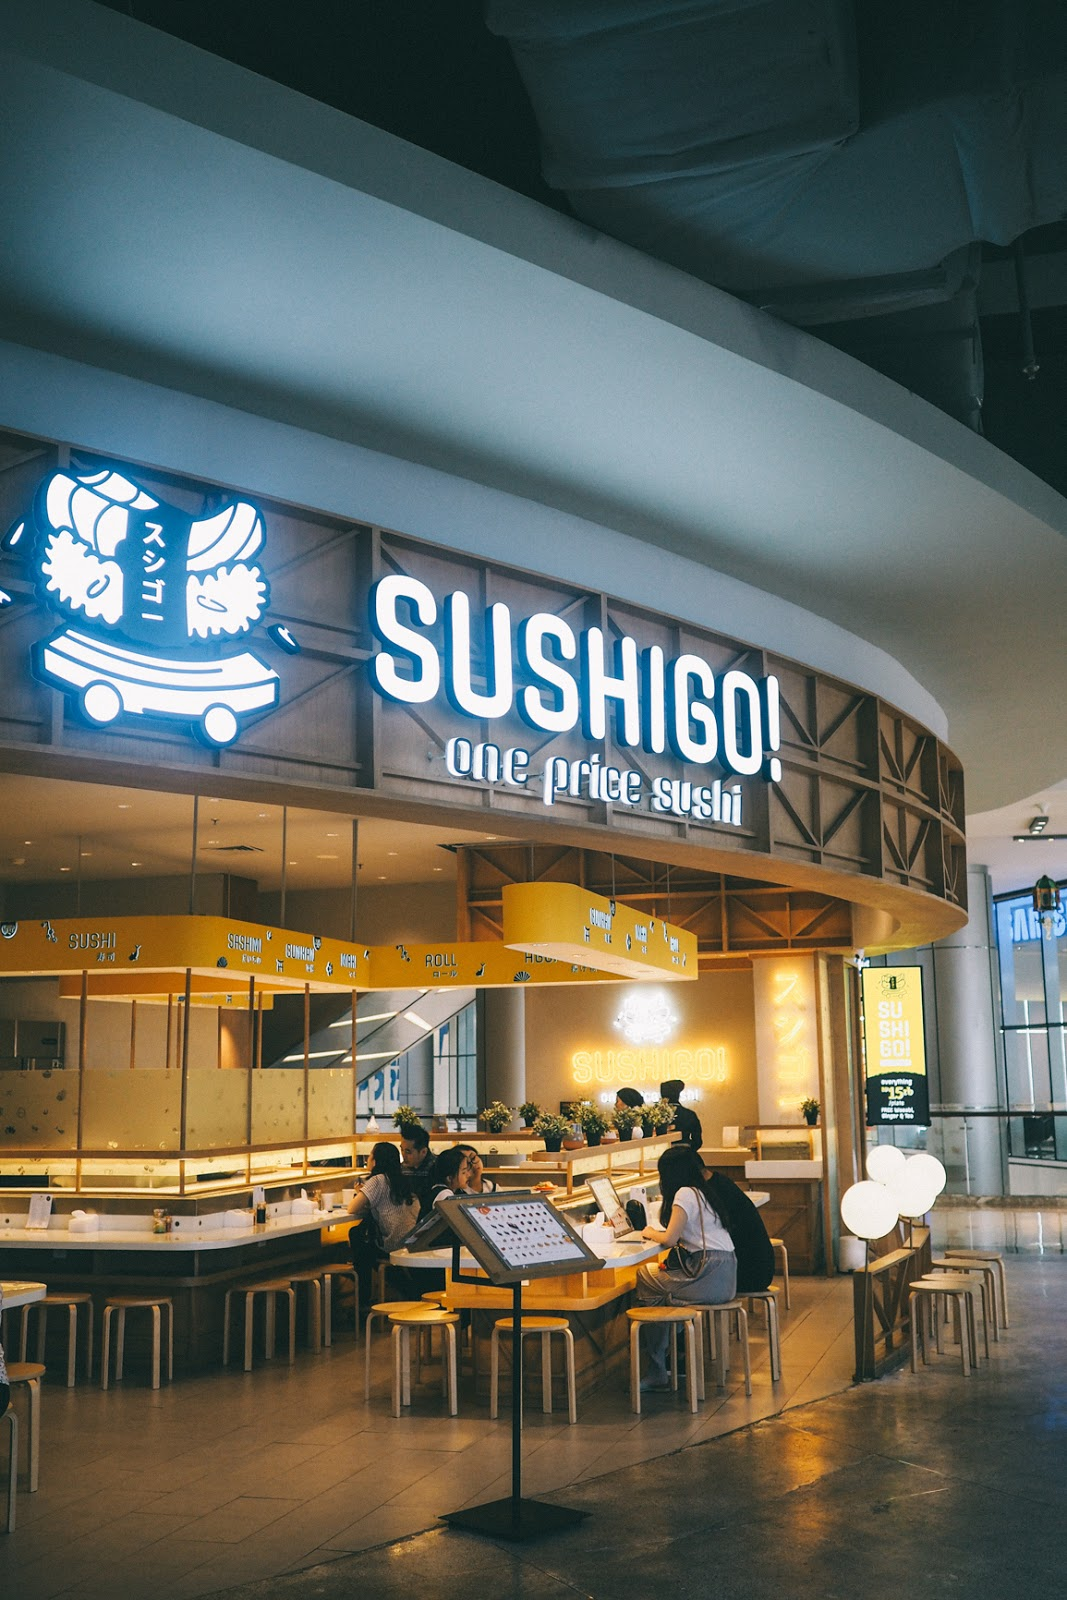 Sushi go dotonburi pik avenue eatandtreats for Food bar pik